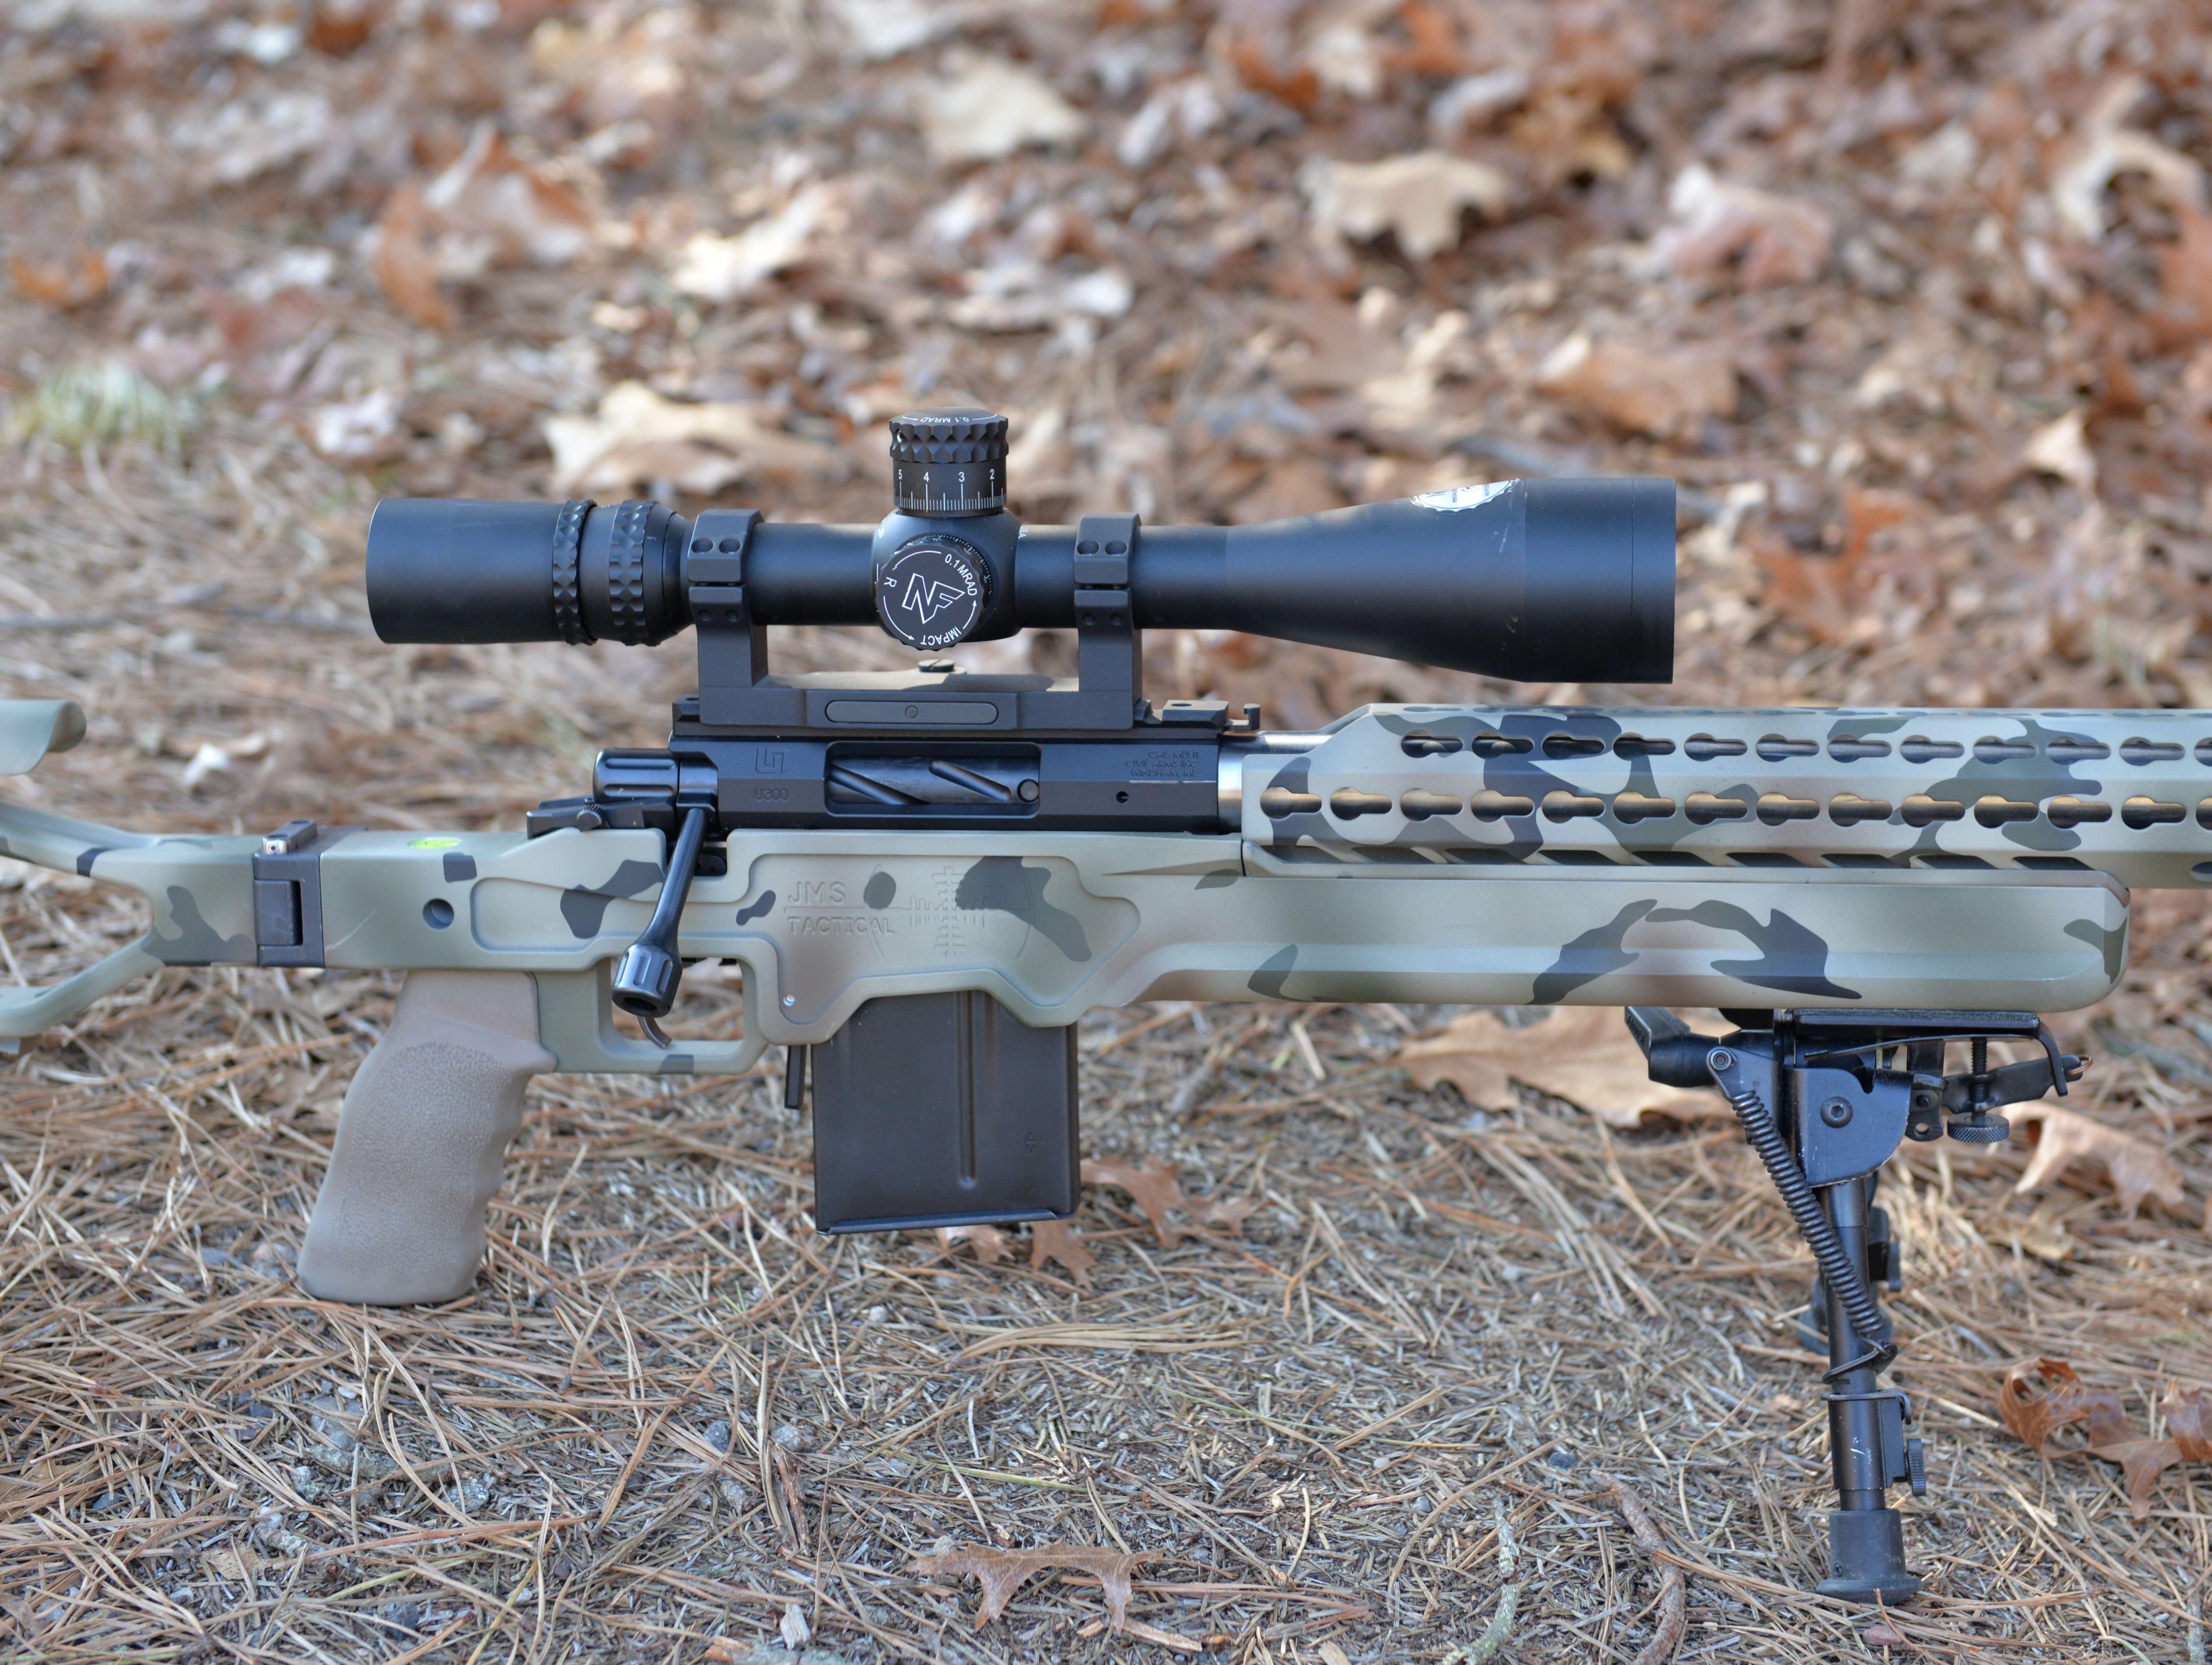 JMS JTAC Thunder chassis review U300 6 Creed – rifleshooter com